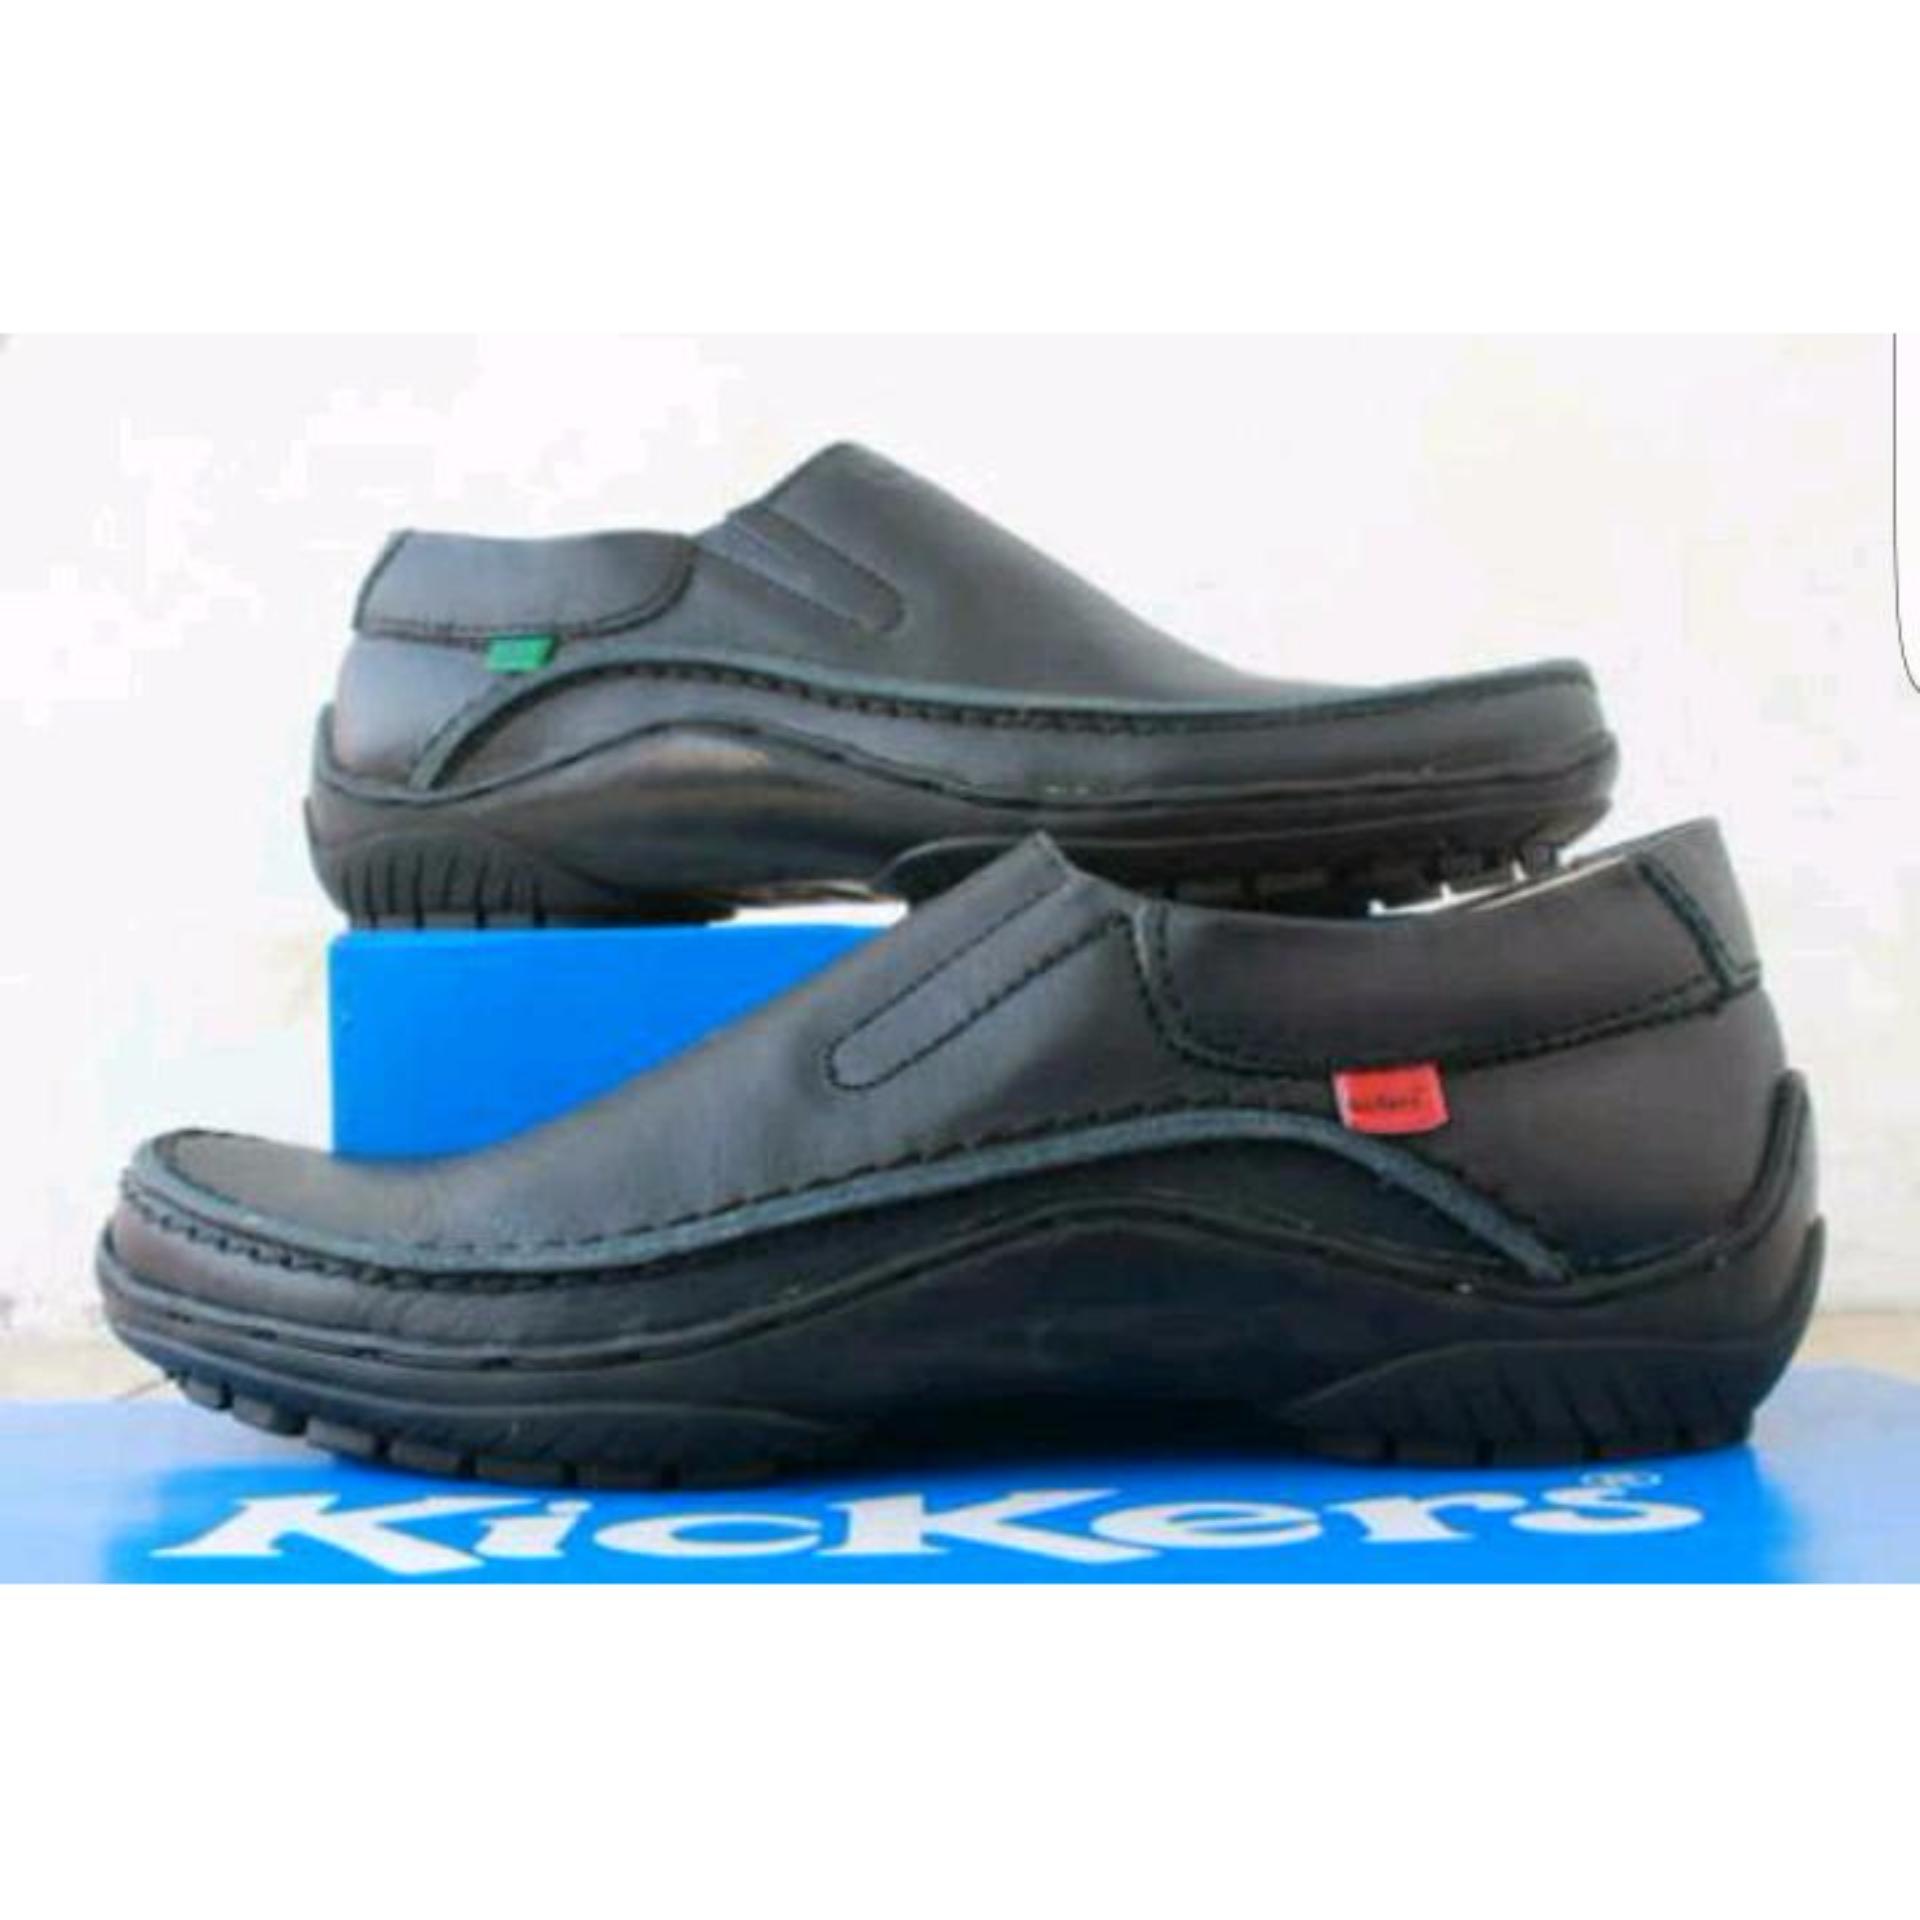 Bsm Soga Sepatu Pantofel Formal Kerja Kantor Kulit Asli Pria Bdr144 275 Boots Elegan Hitam Cocoes Marker Brown Source